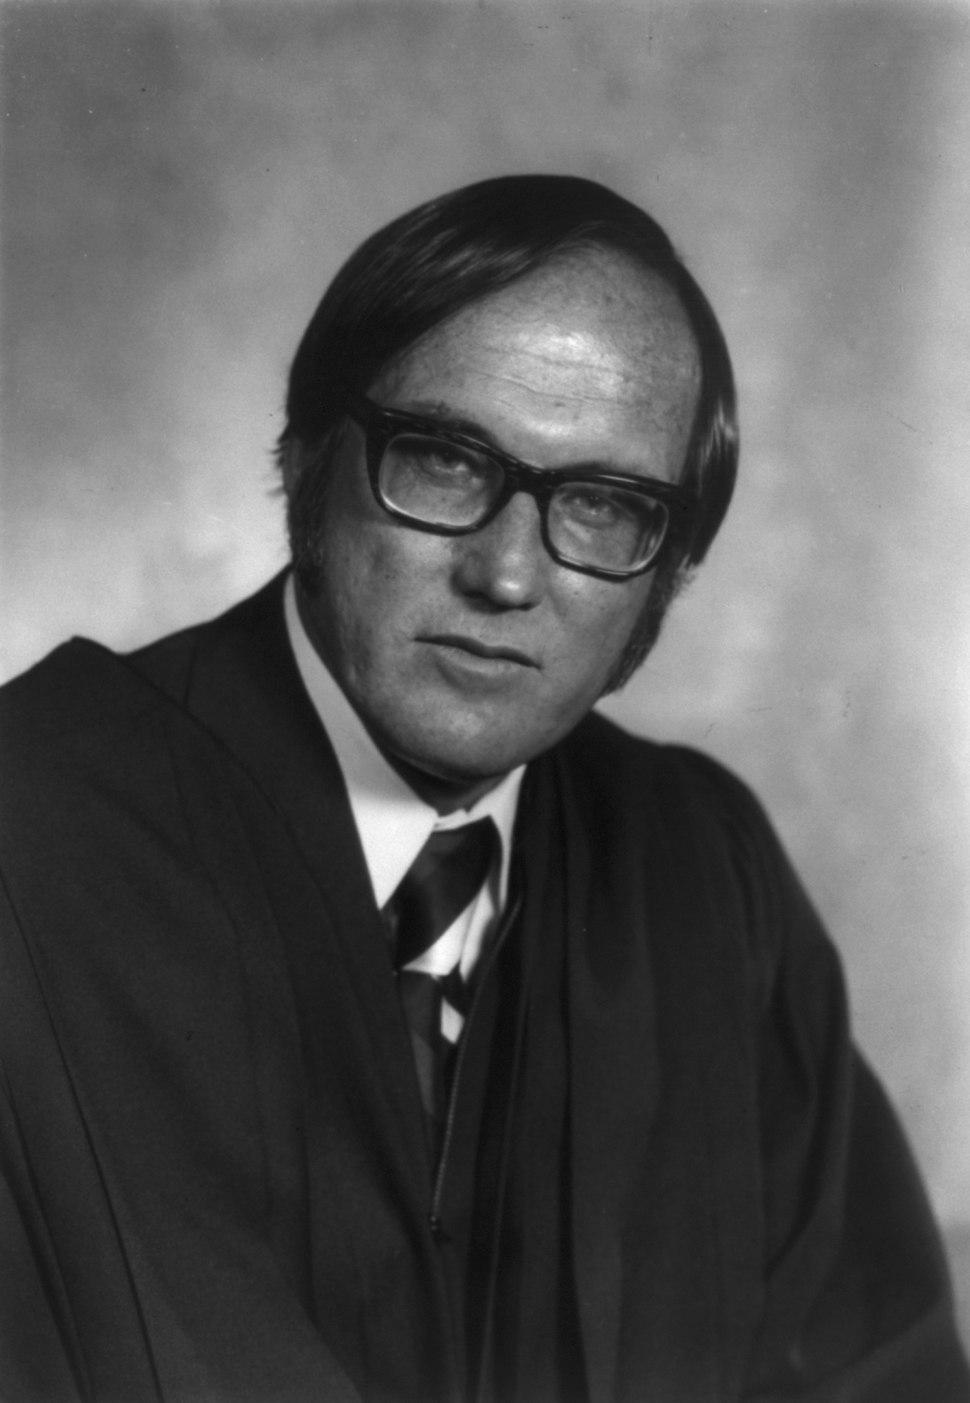 William Rehnquist official portrait 1972